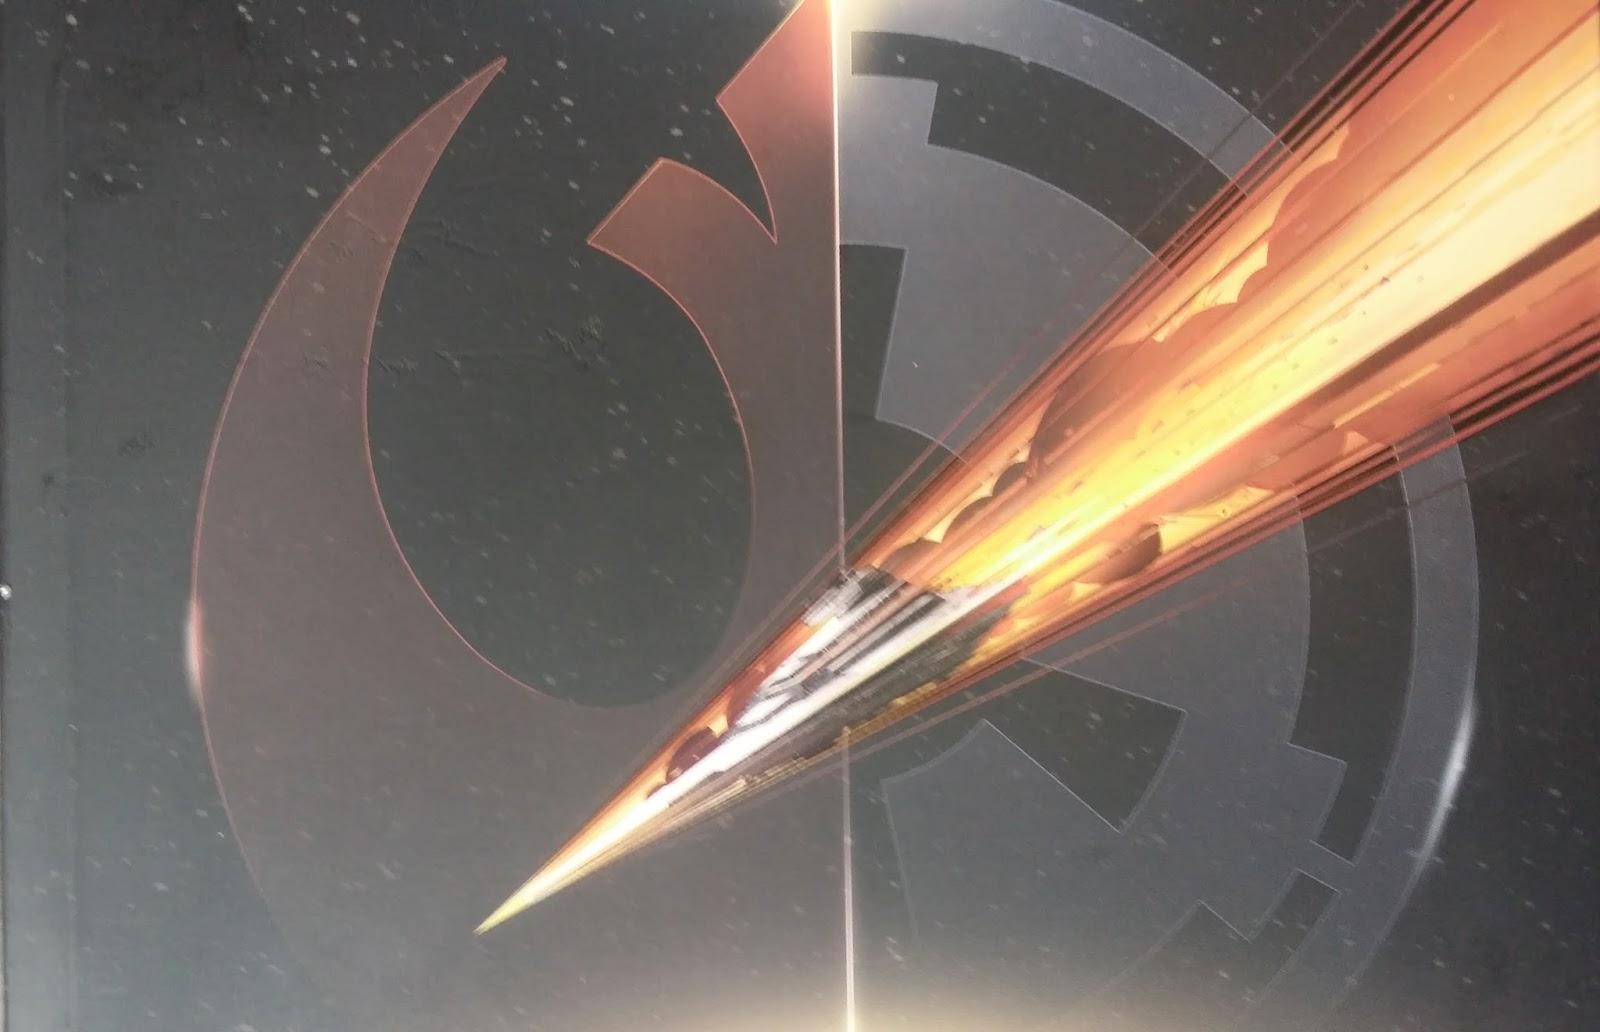 Resenha | Star Wars: Estrelas Perdidas (Claudia Gray)